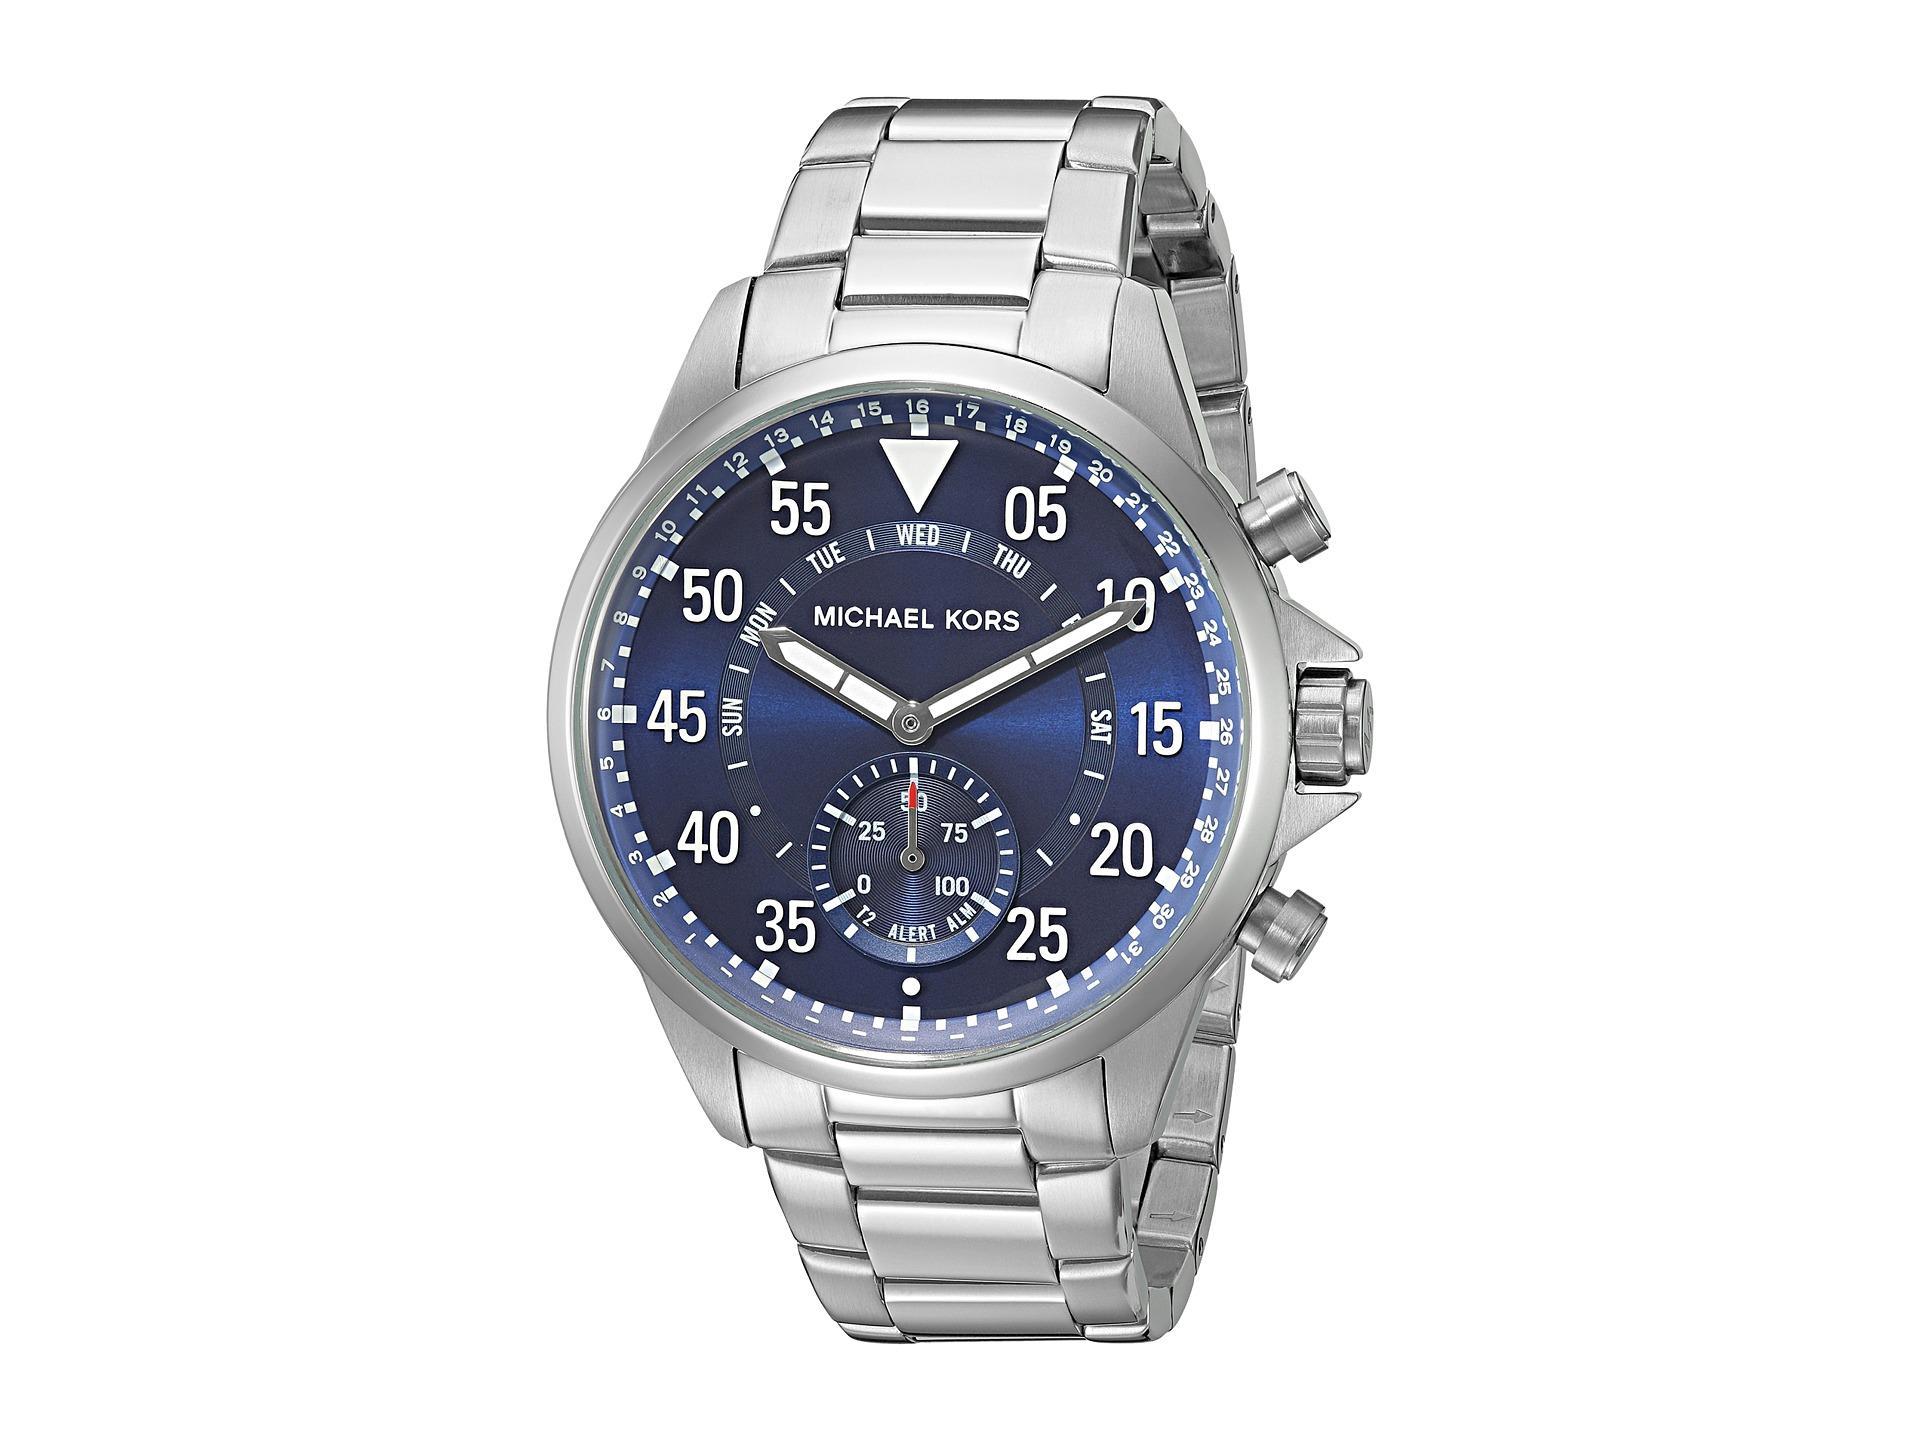 e97f9c390ebd Lyst - Michael Kors Gage Hybrid Smartwatch - Mkt4000 in Metallic for Men